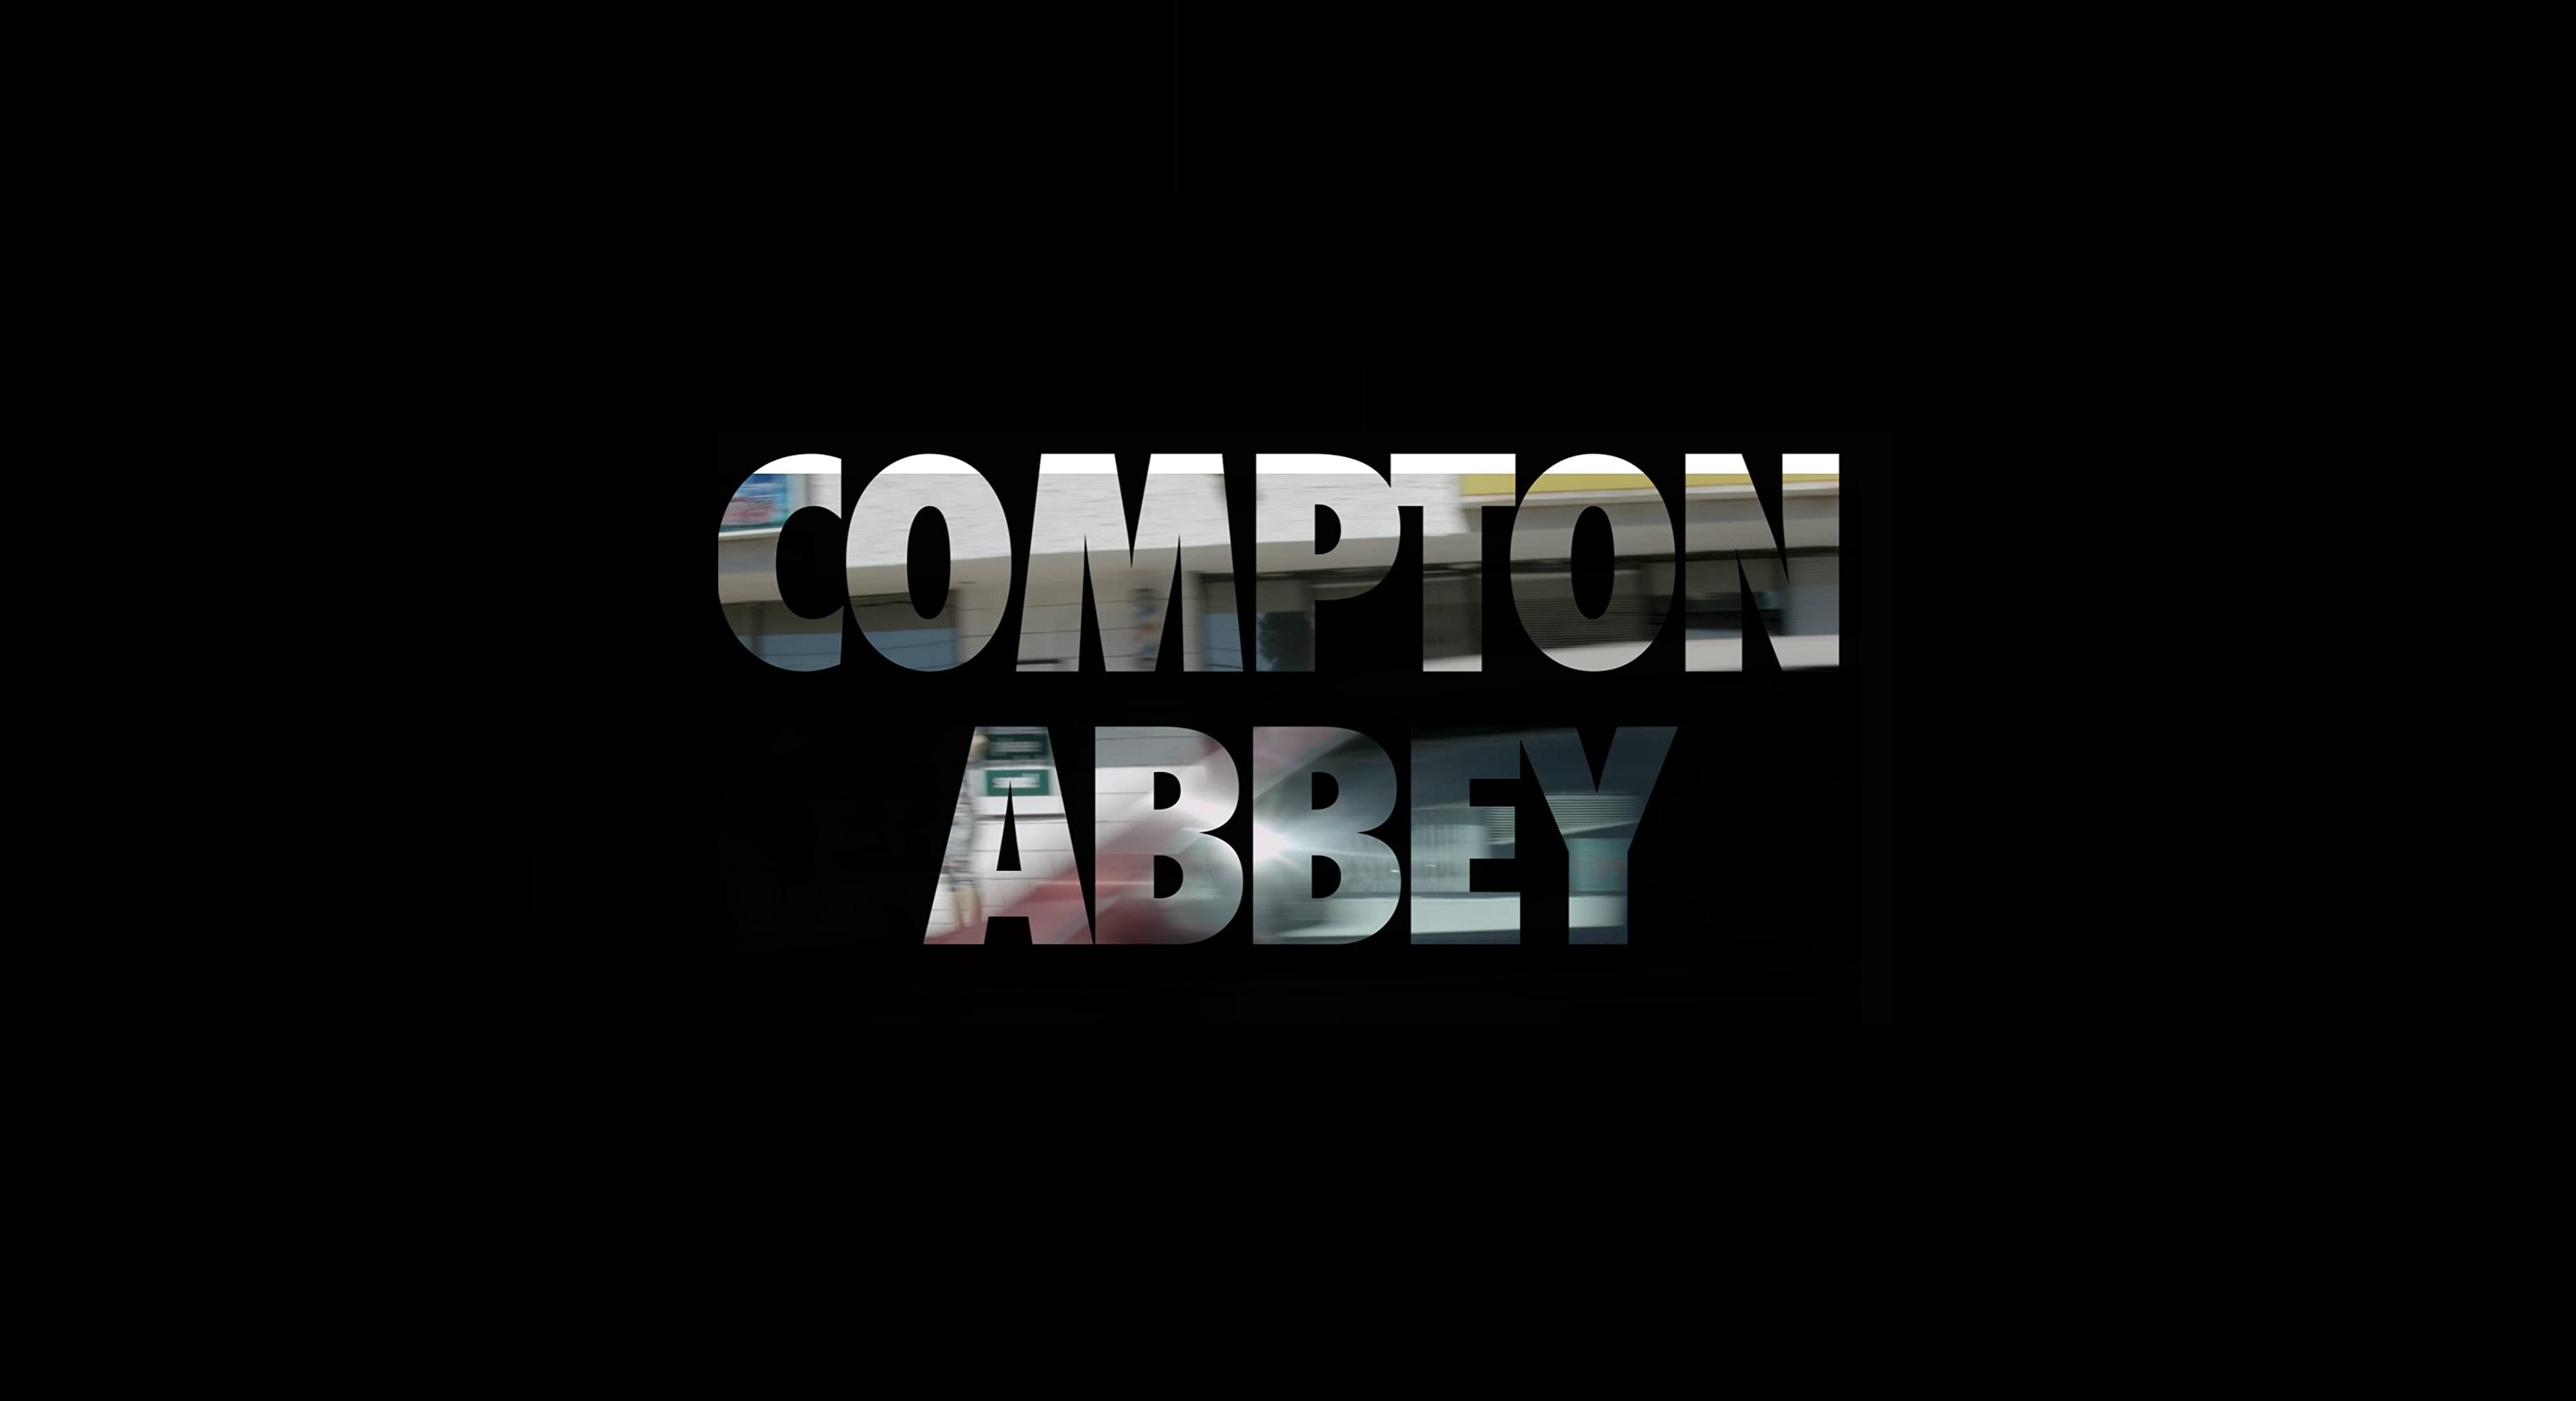 Compton Abbey (2018)